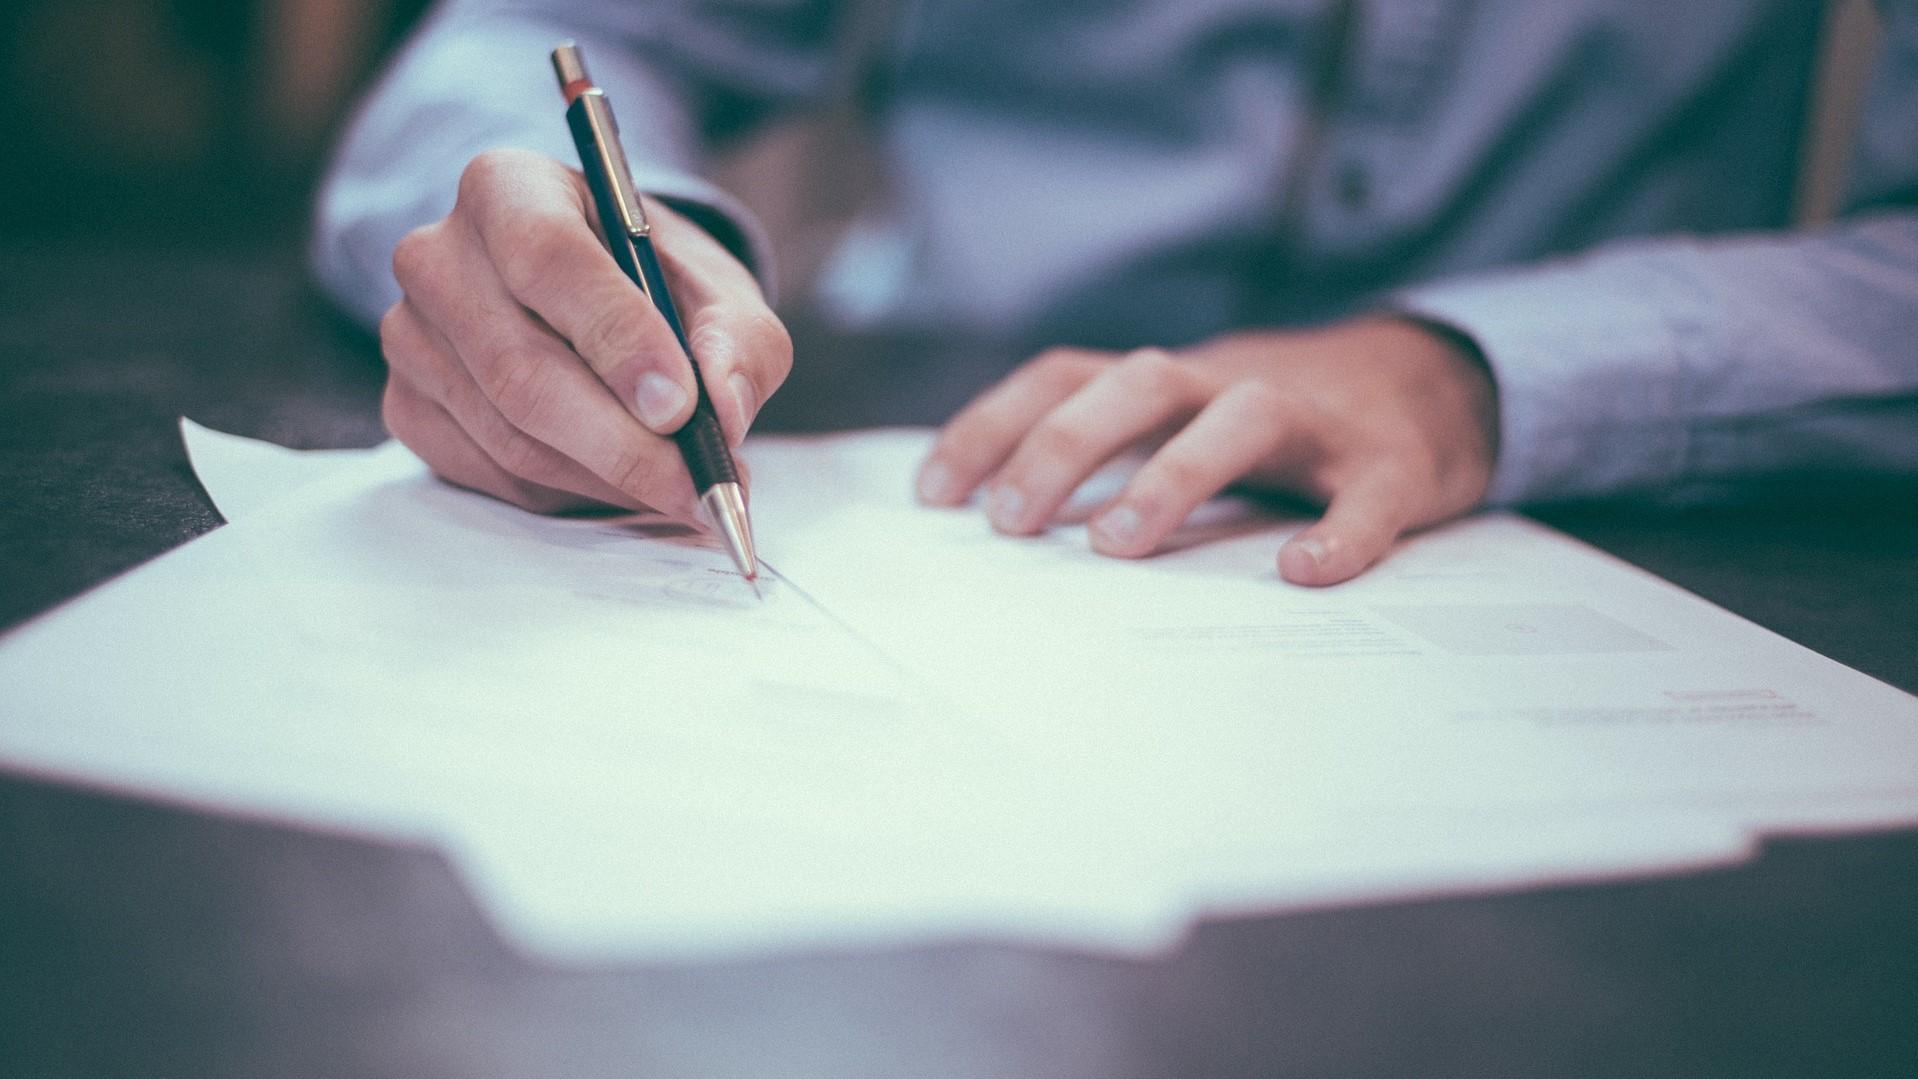 特許申請書類の翻訳